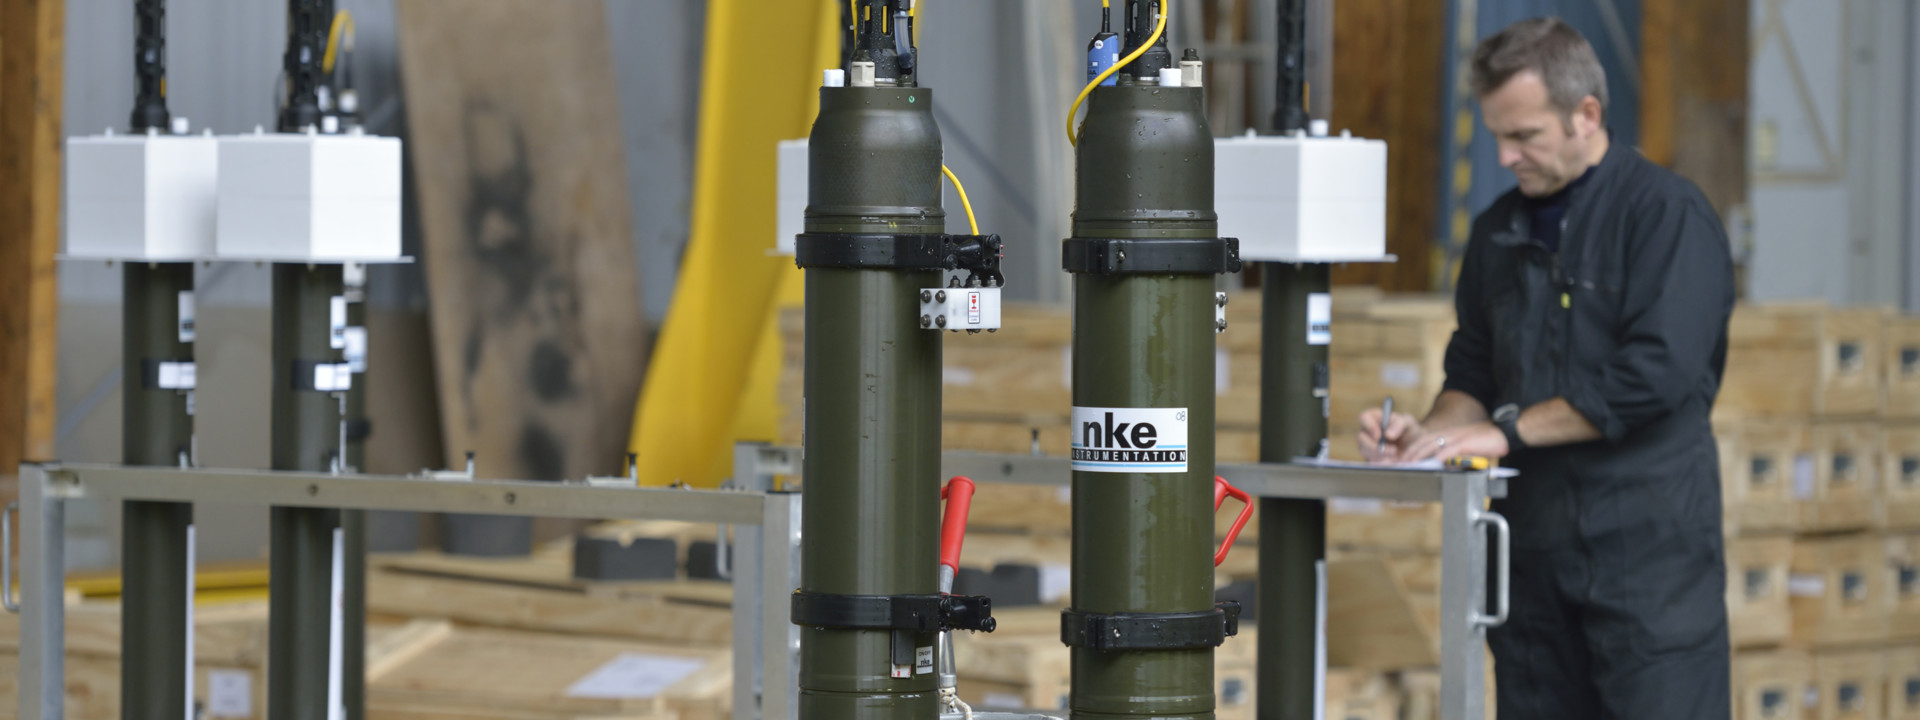 Arvor and Provor tested in Ifremer tank - 2014